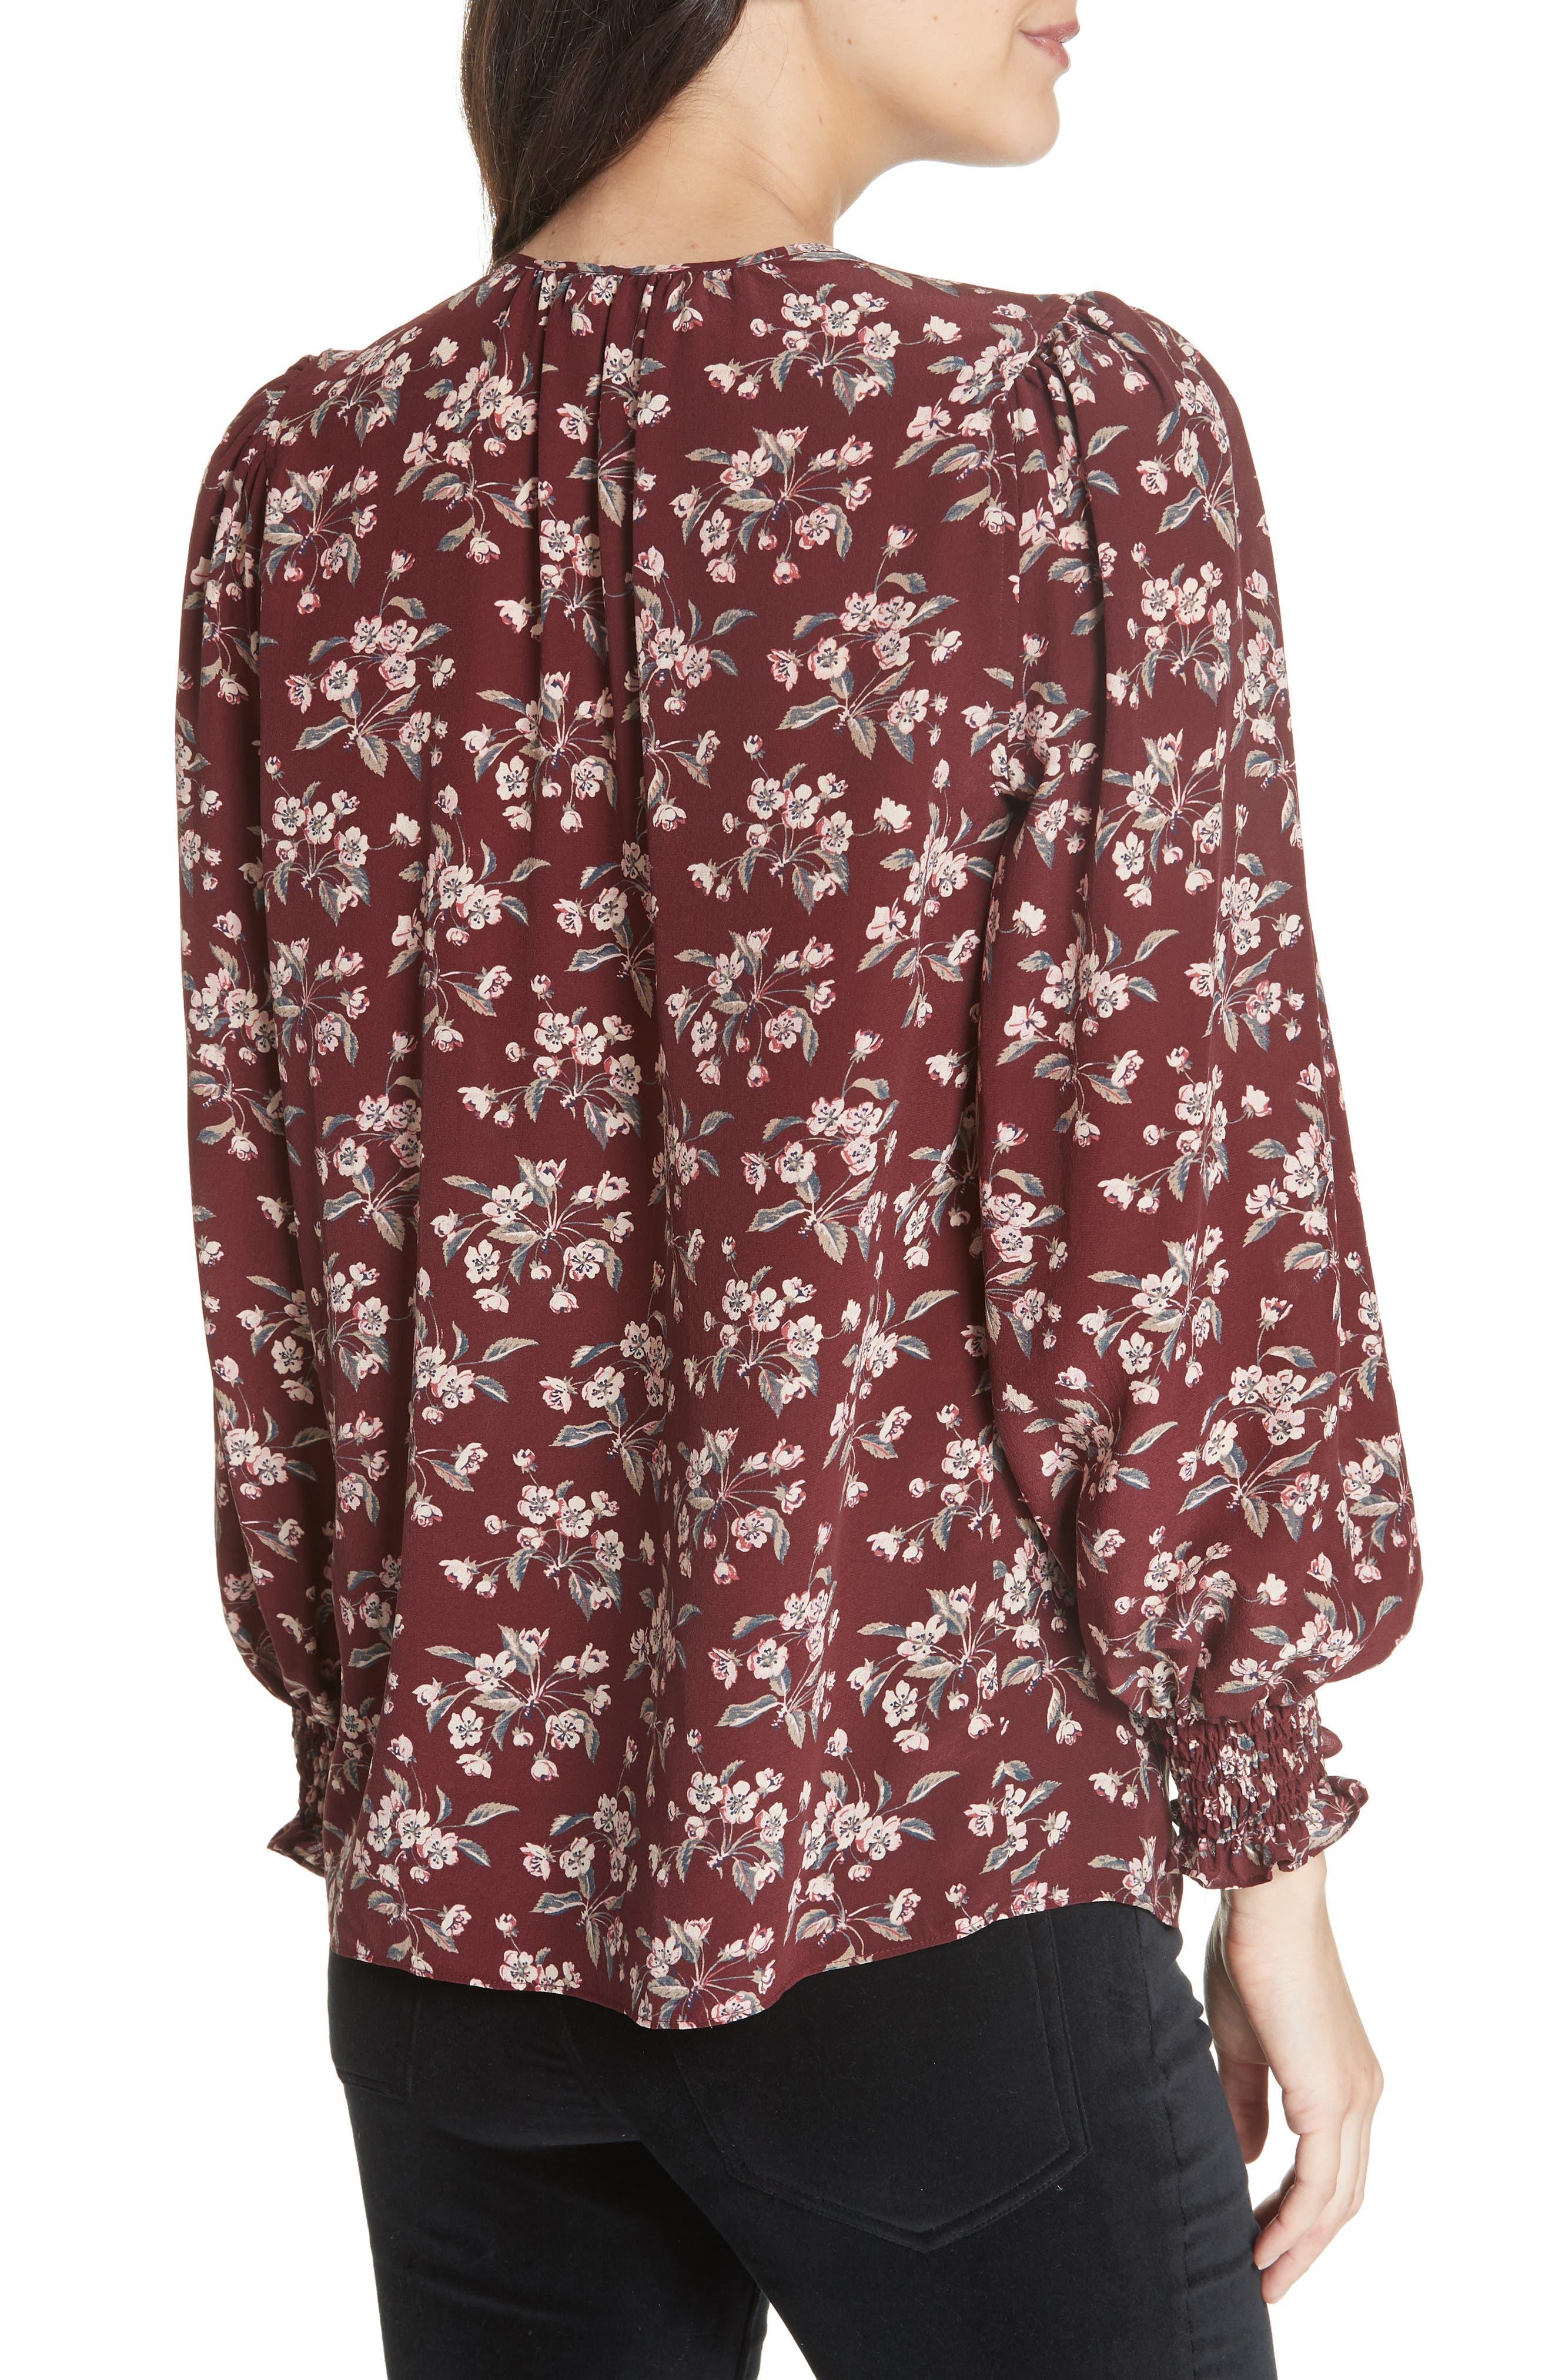 Tilda Silk Floral Top,                             Alternate thumbnail 2, color,                             BURGUNDY COMBO